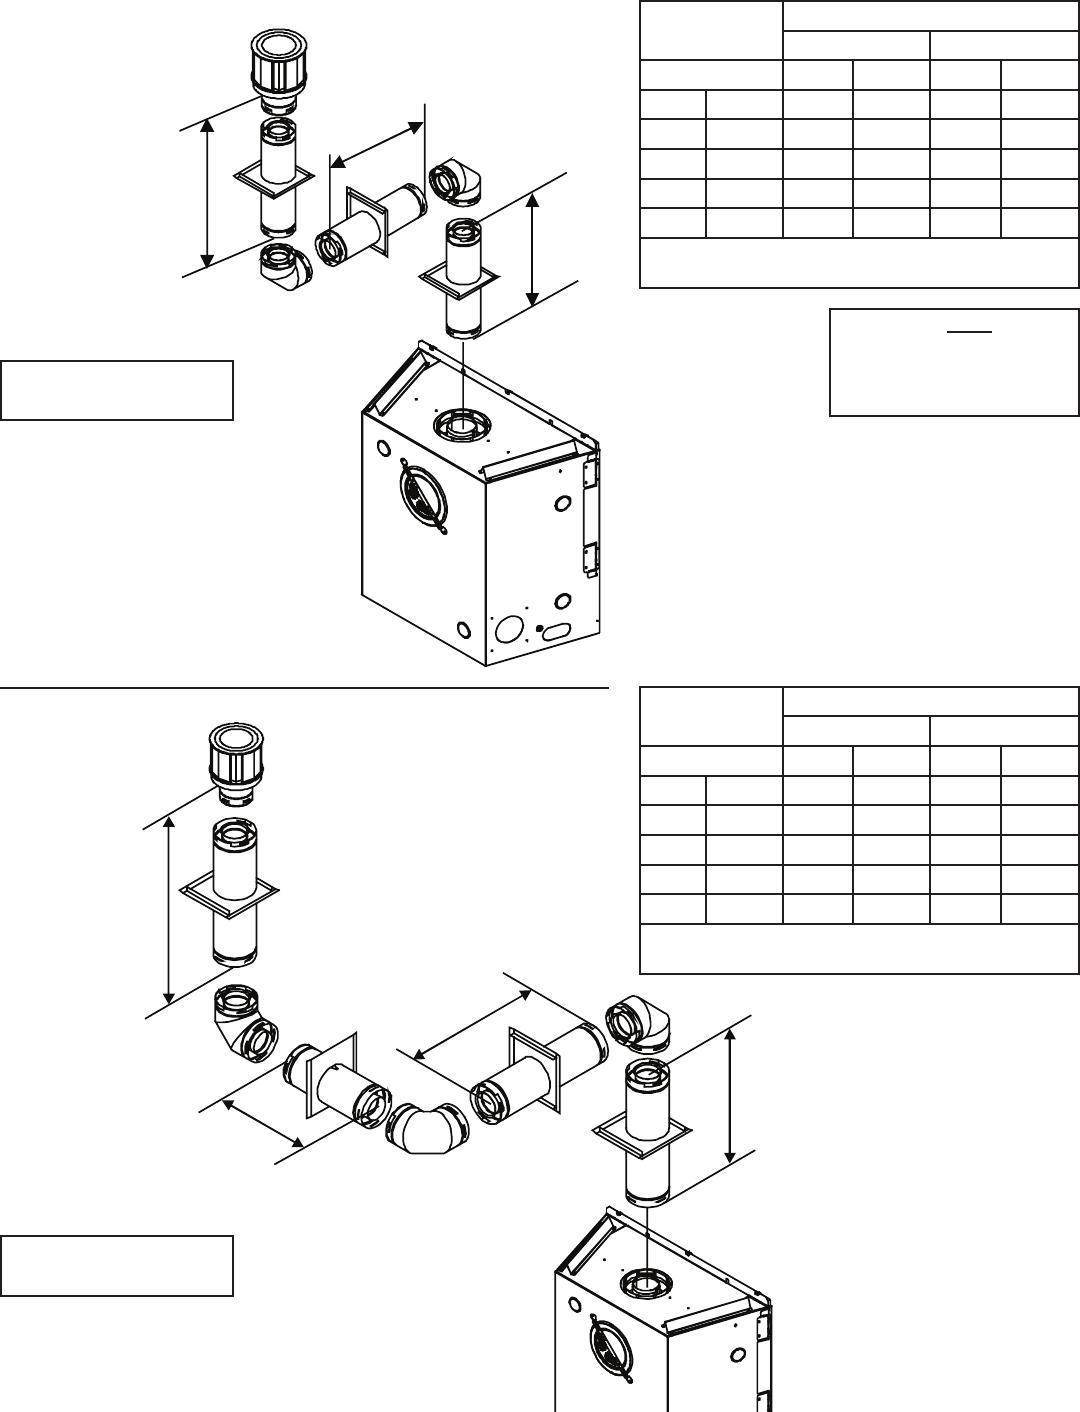 martin fireplaces heart home technologies be 36 c be 36 cipi rh rsmanuals com Martin Fireplace AC36 Parts Martin Fireplace Inserts